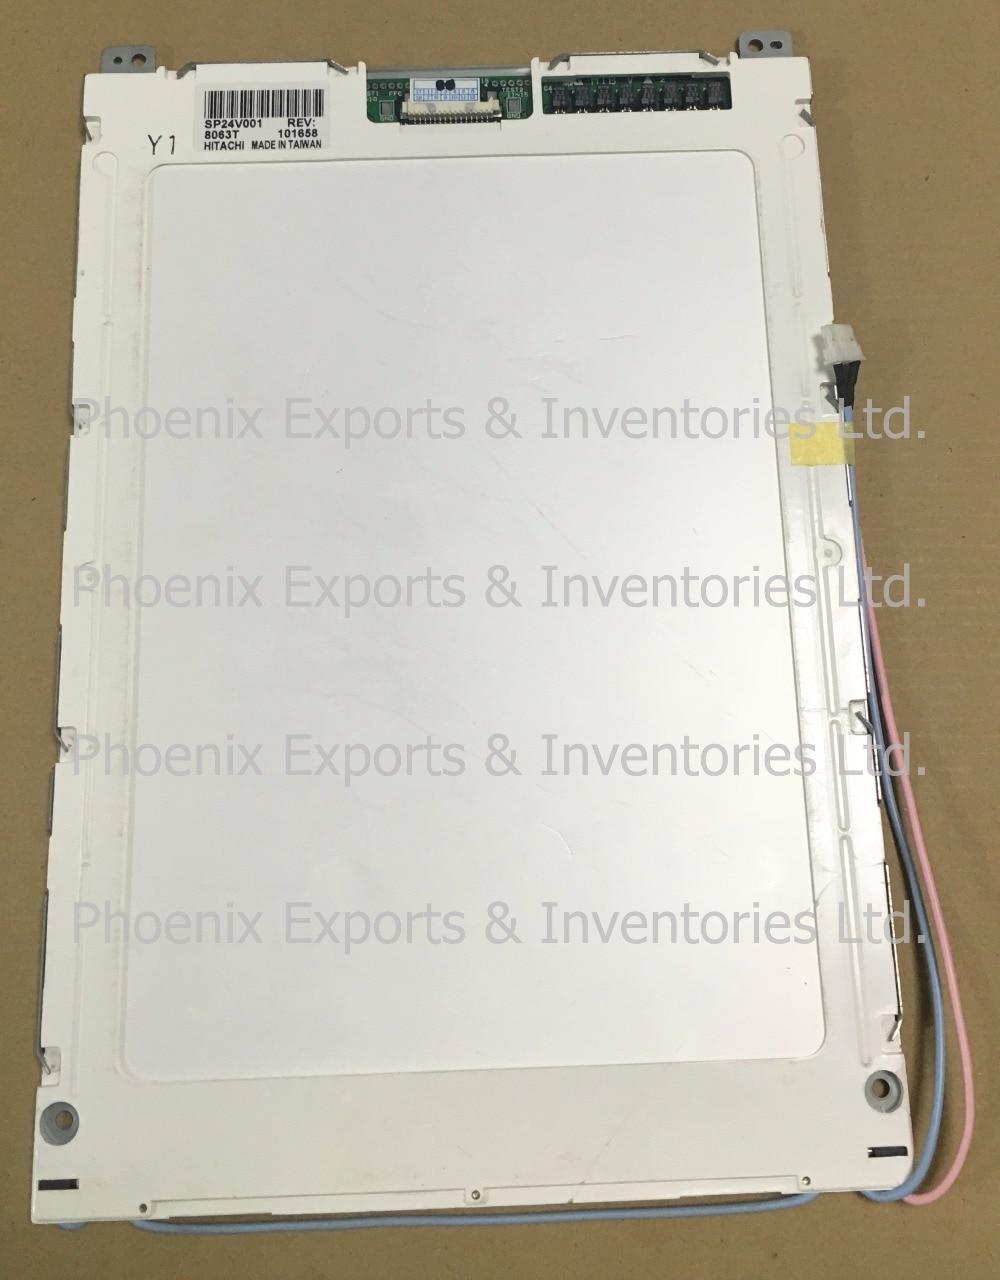 SP24V001 9 4 640 480 LCD DISPLAY PANEL